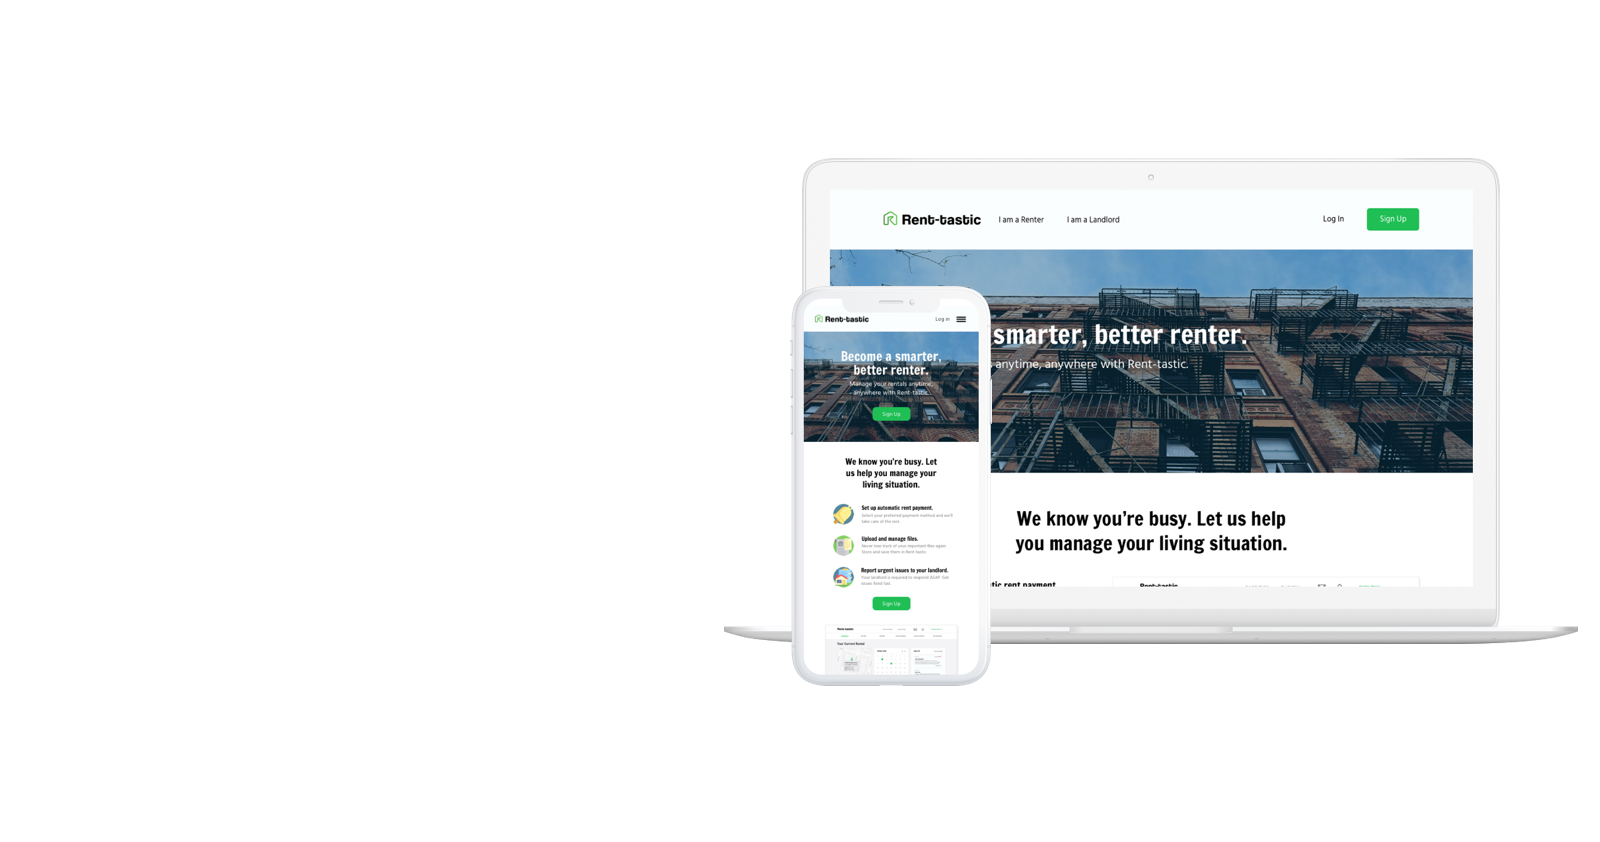 Rent-tastic - A responsive platform for renters